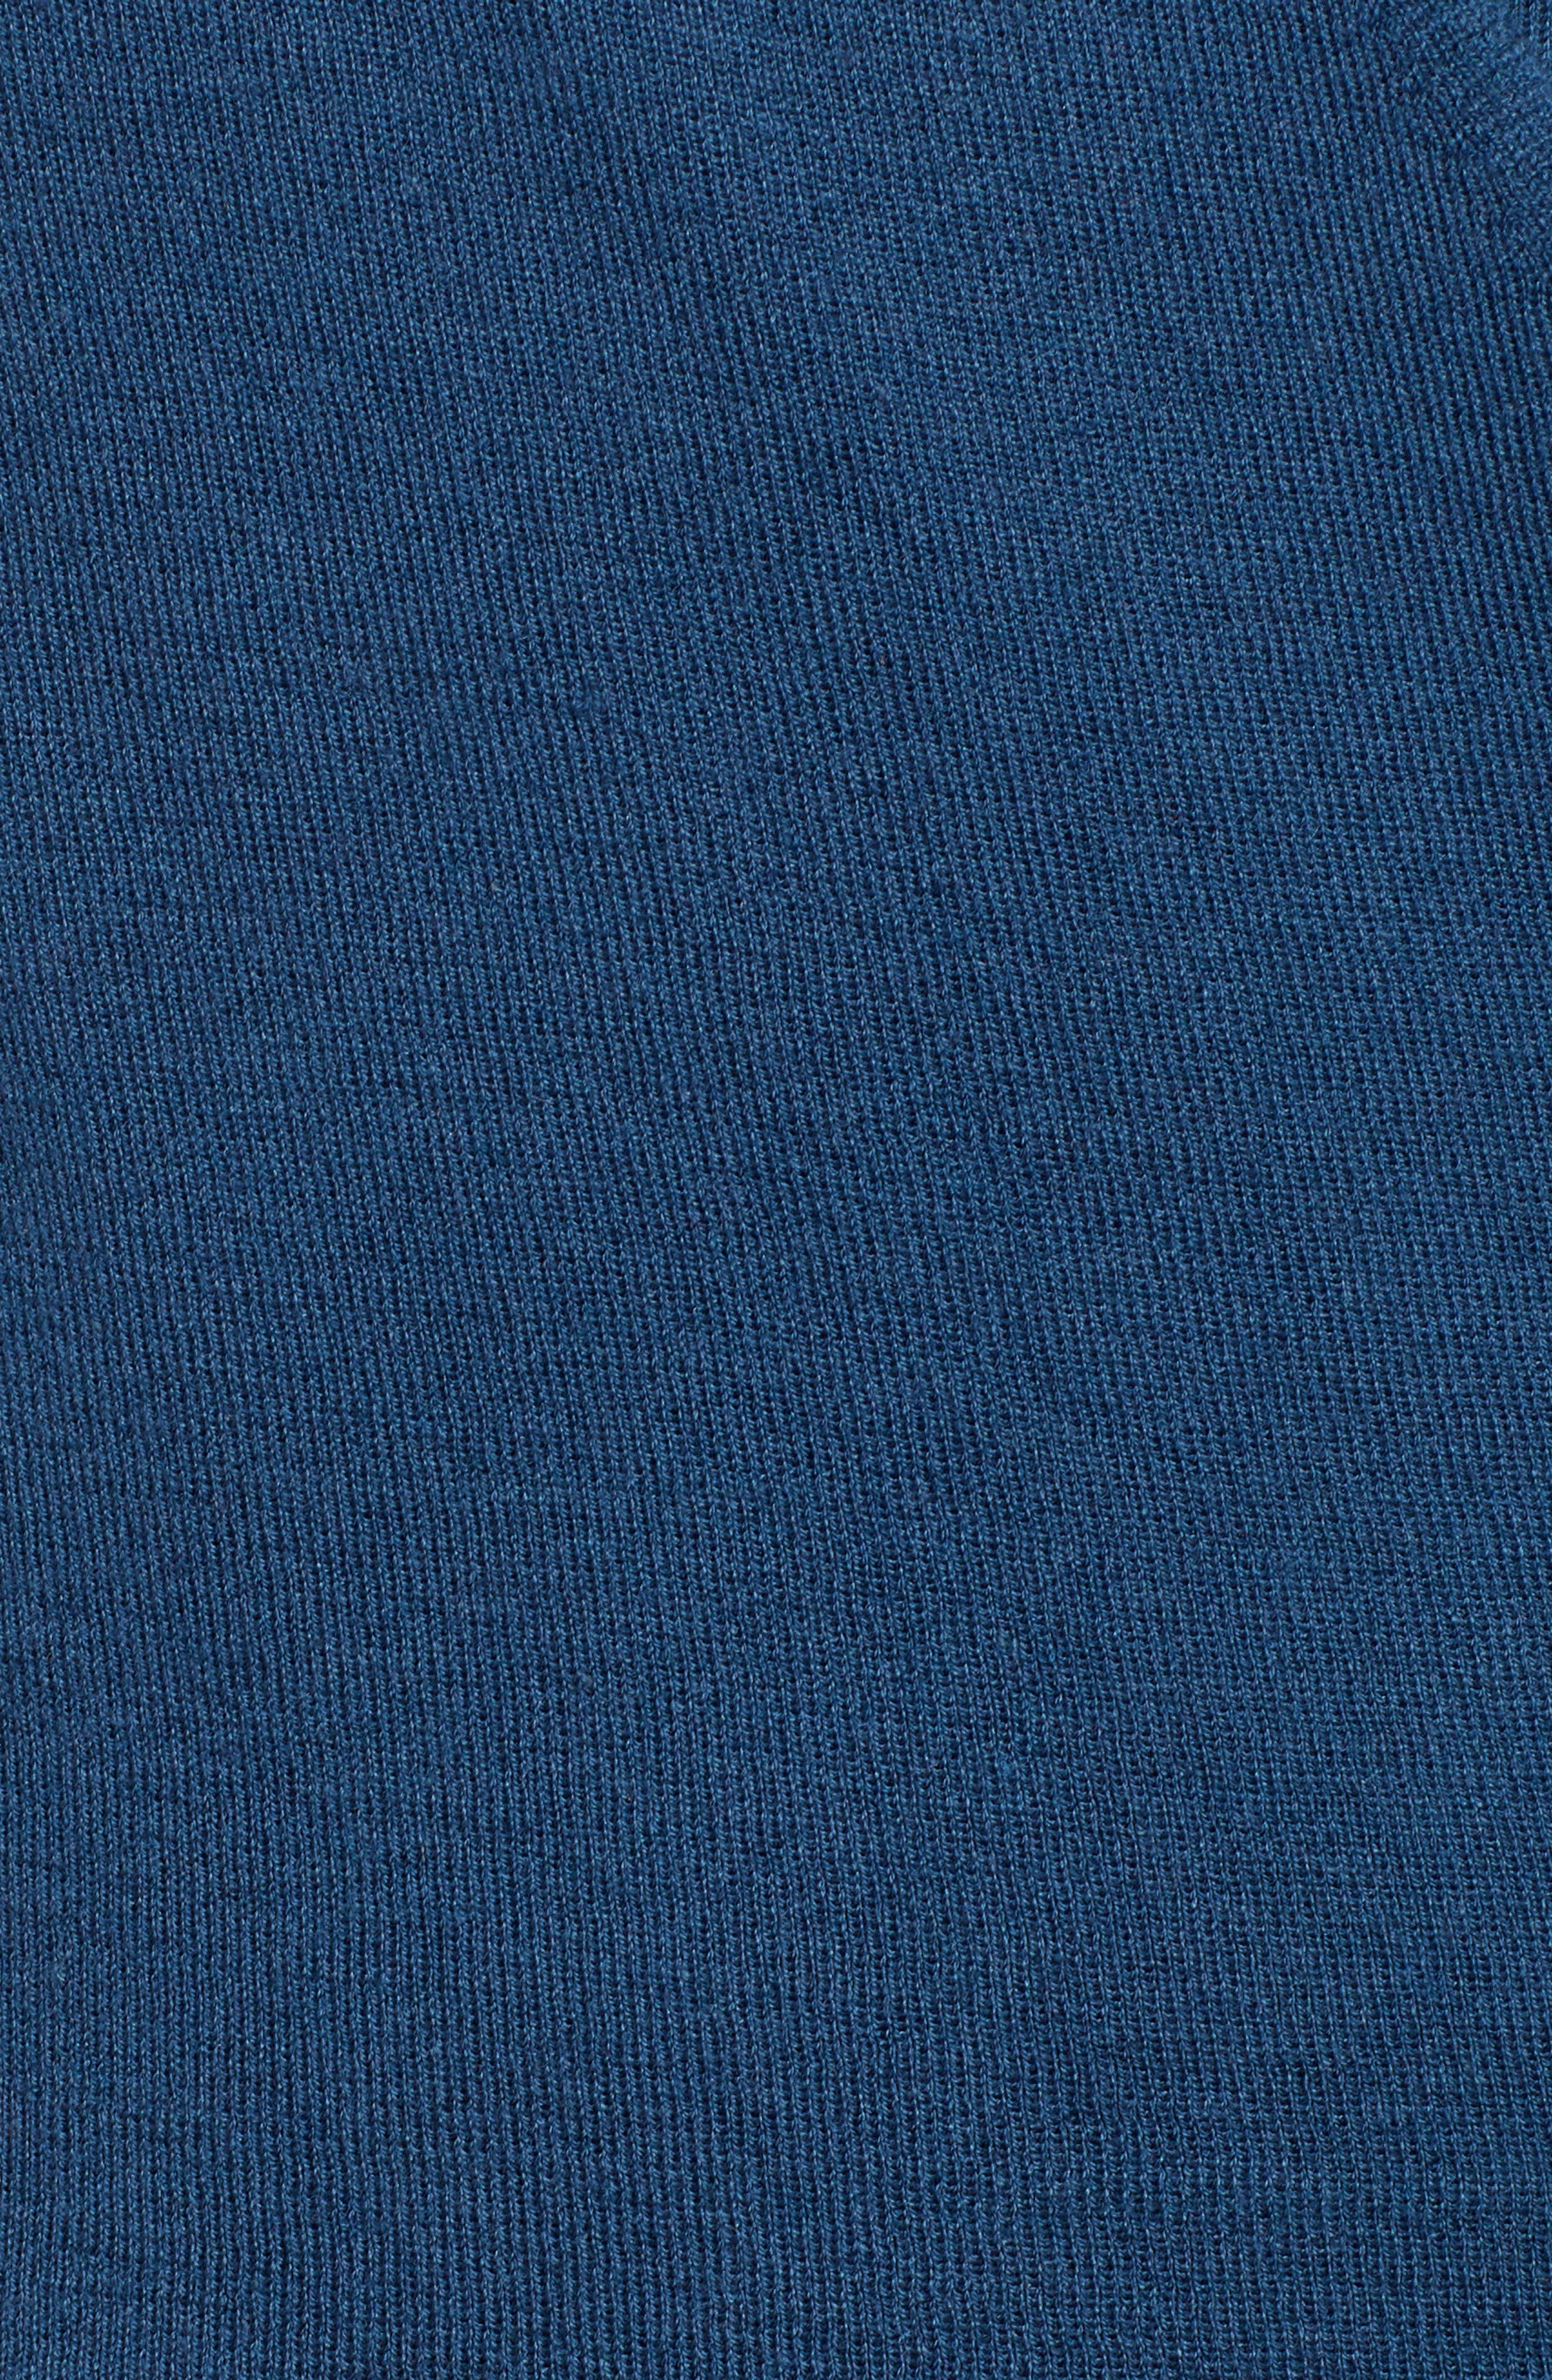 4-Way Convertible Lightweight Cardigan,                             Alternate thumbnail 418, color,